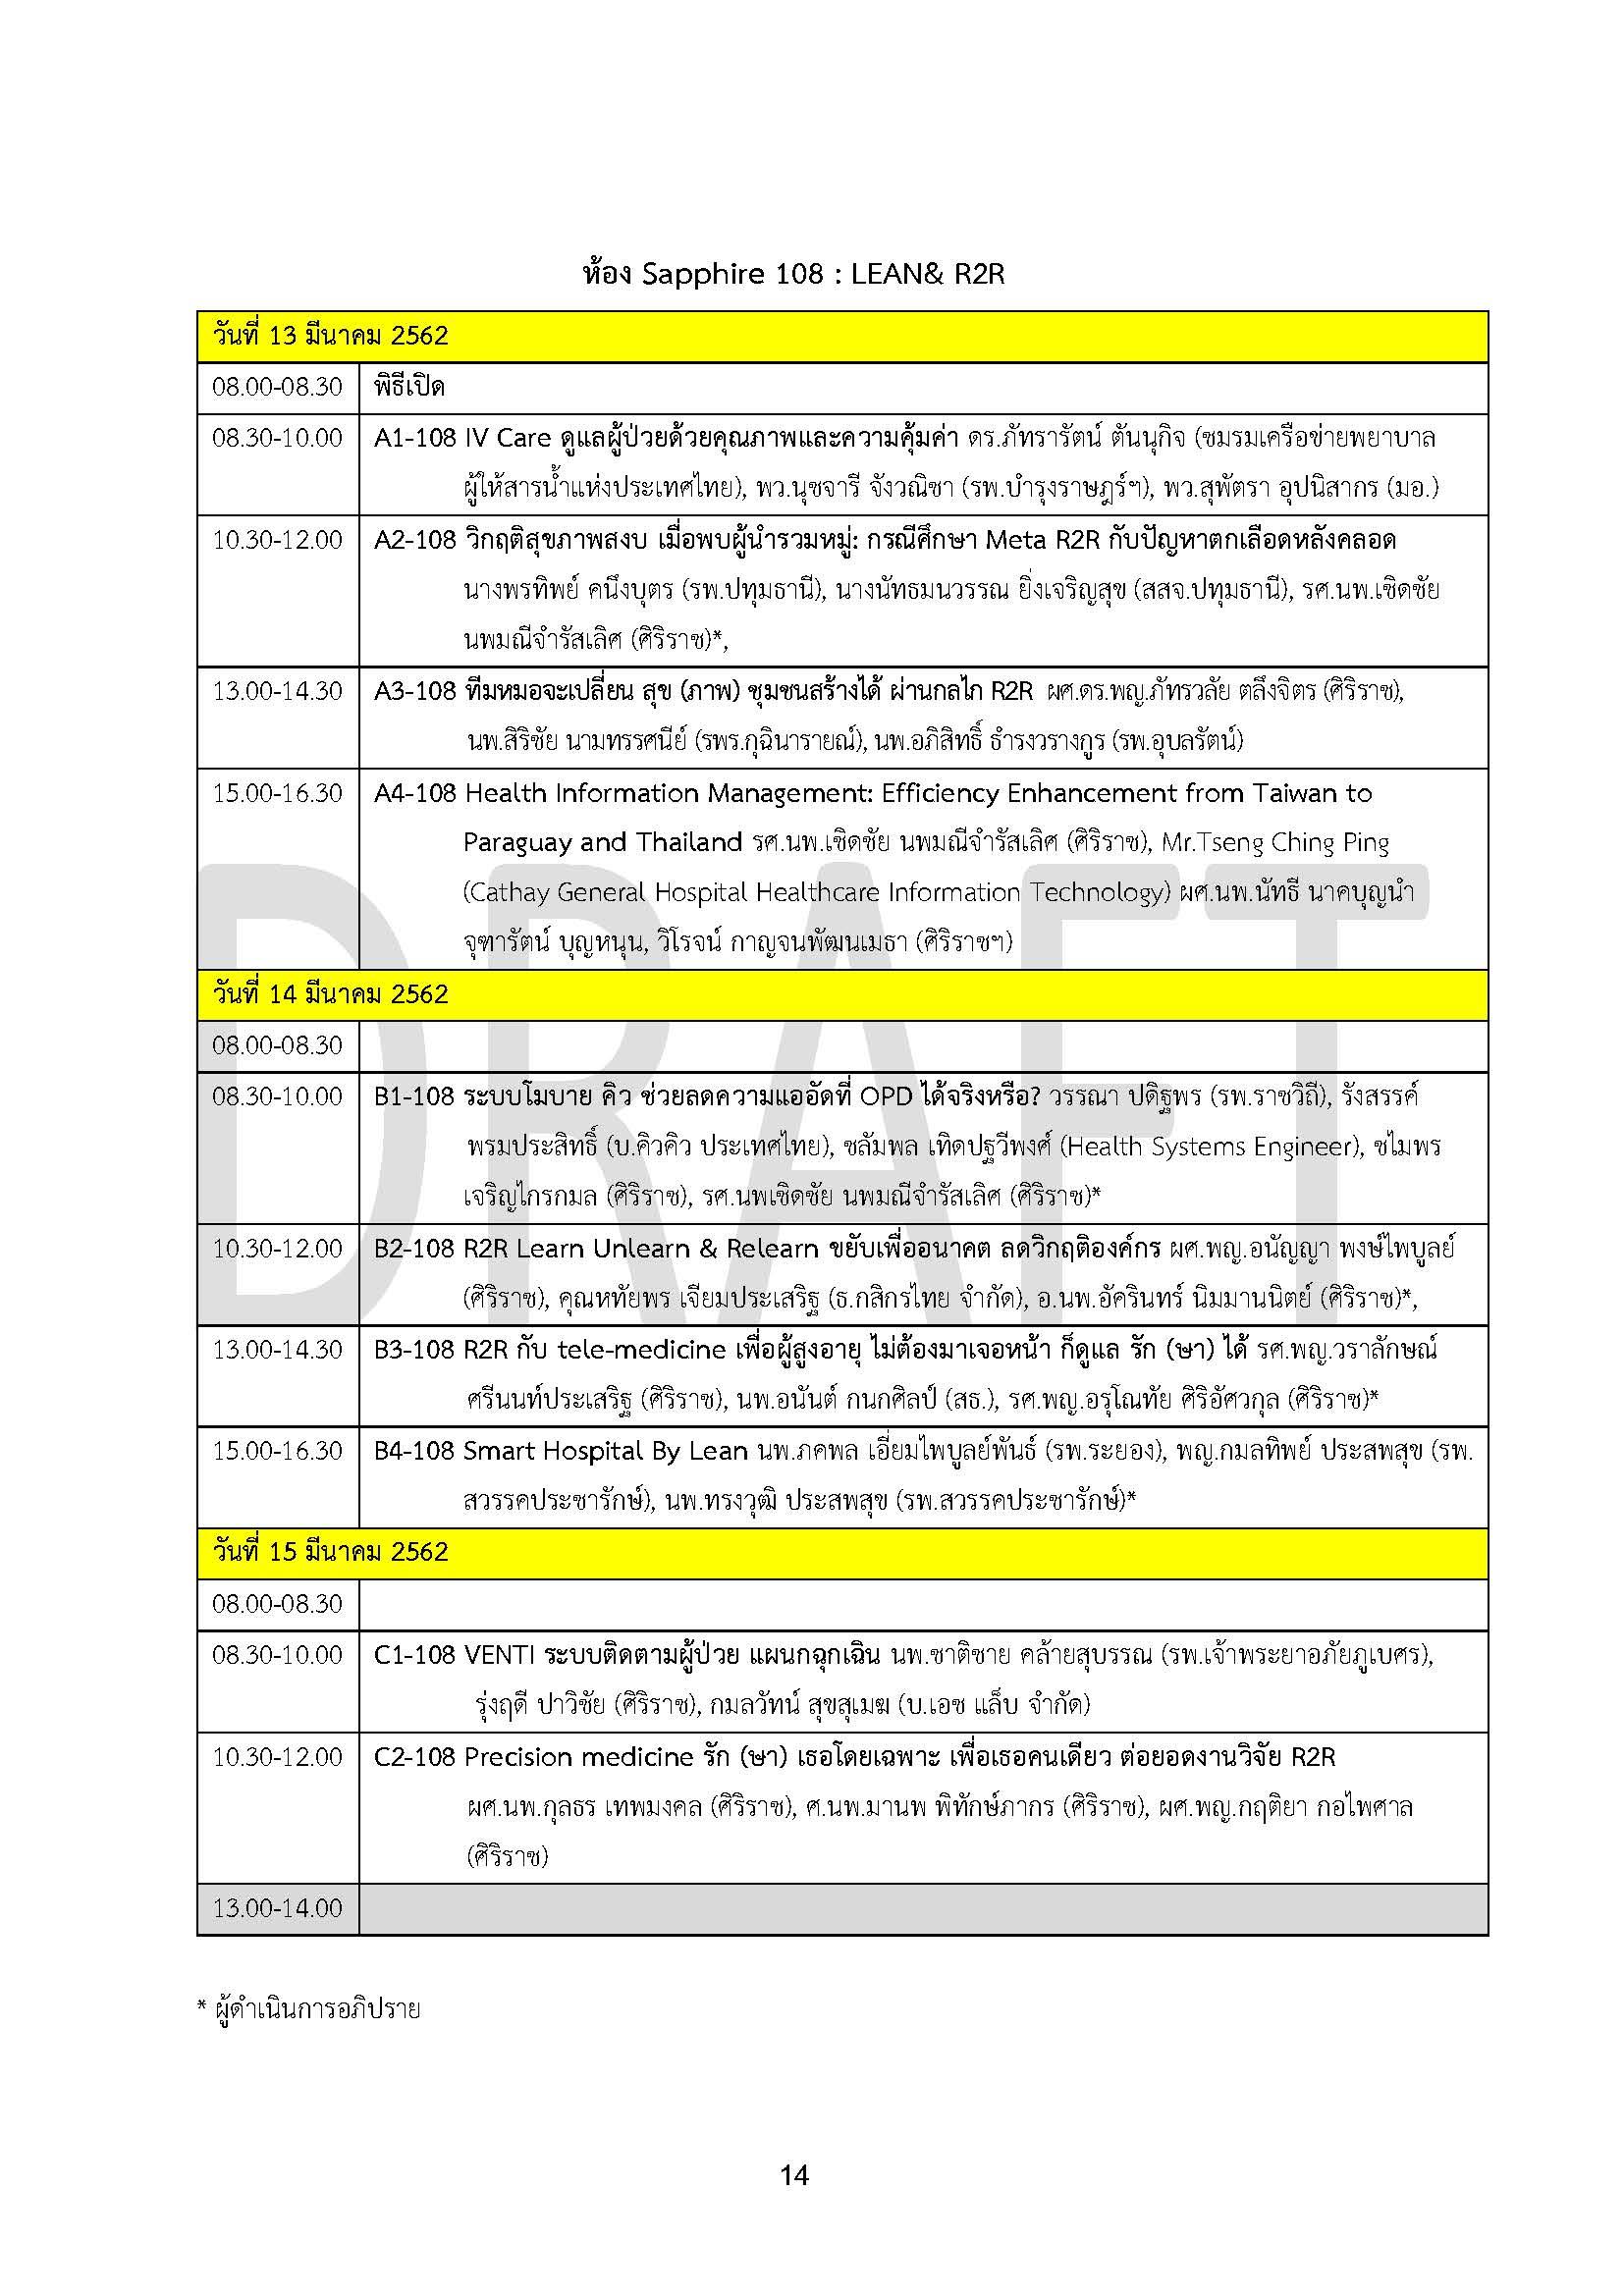 info_agenda_14